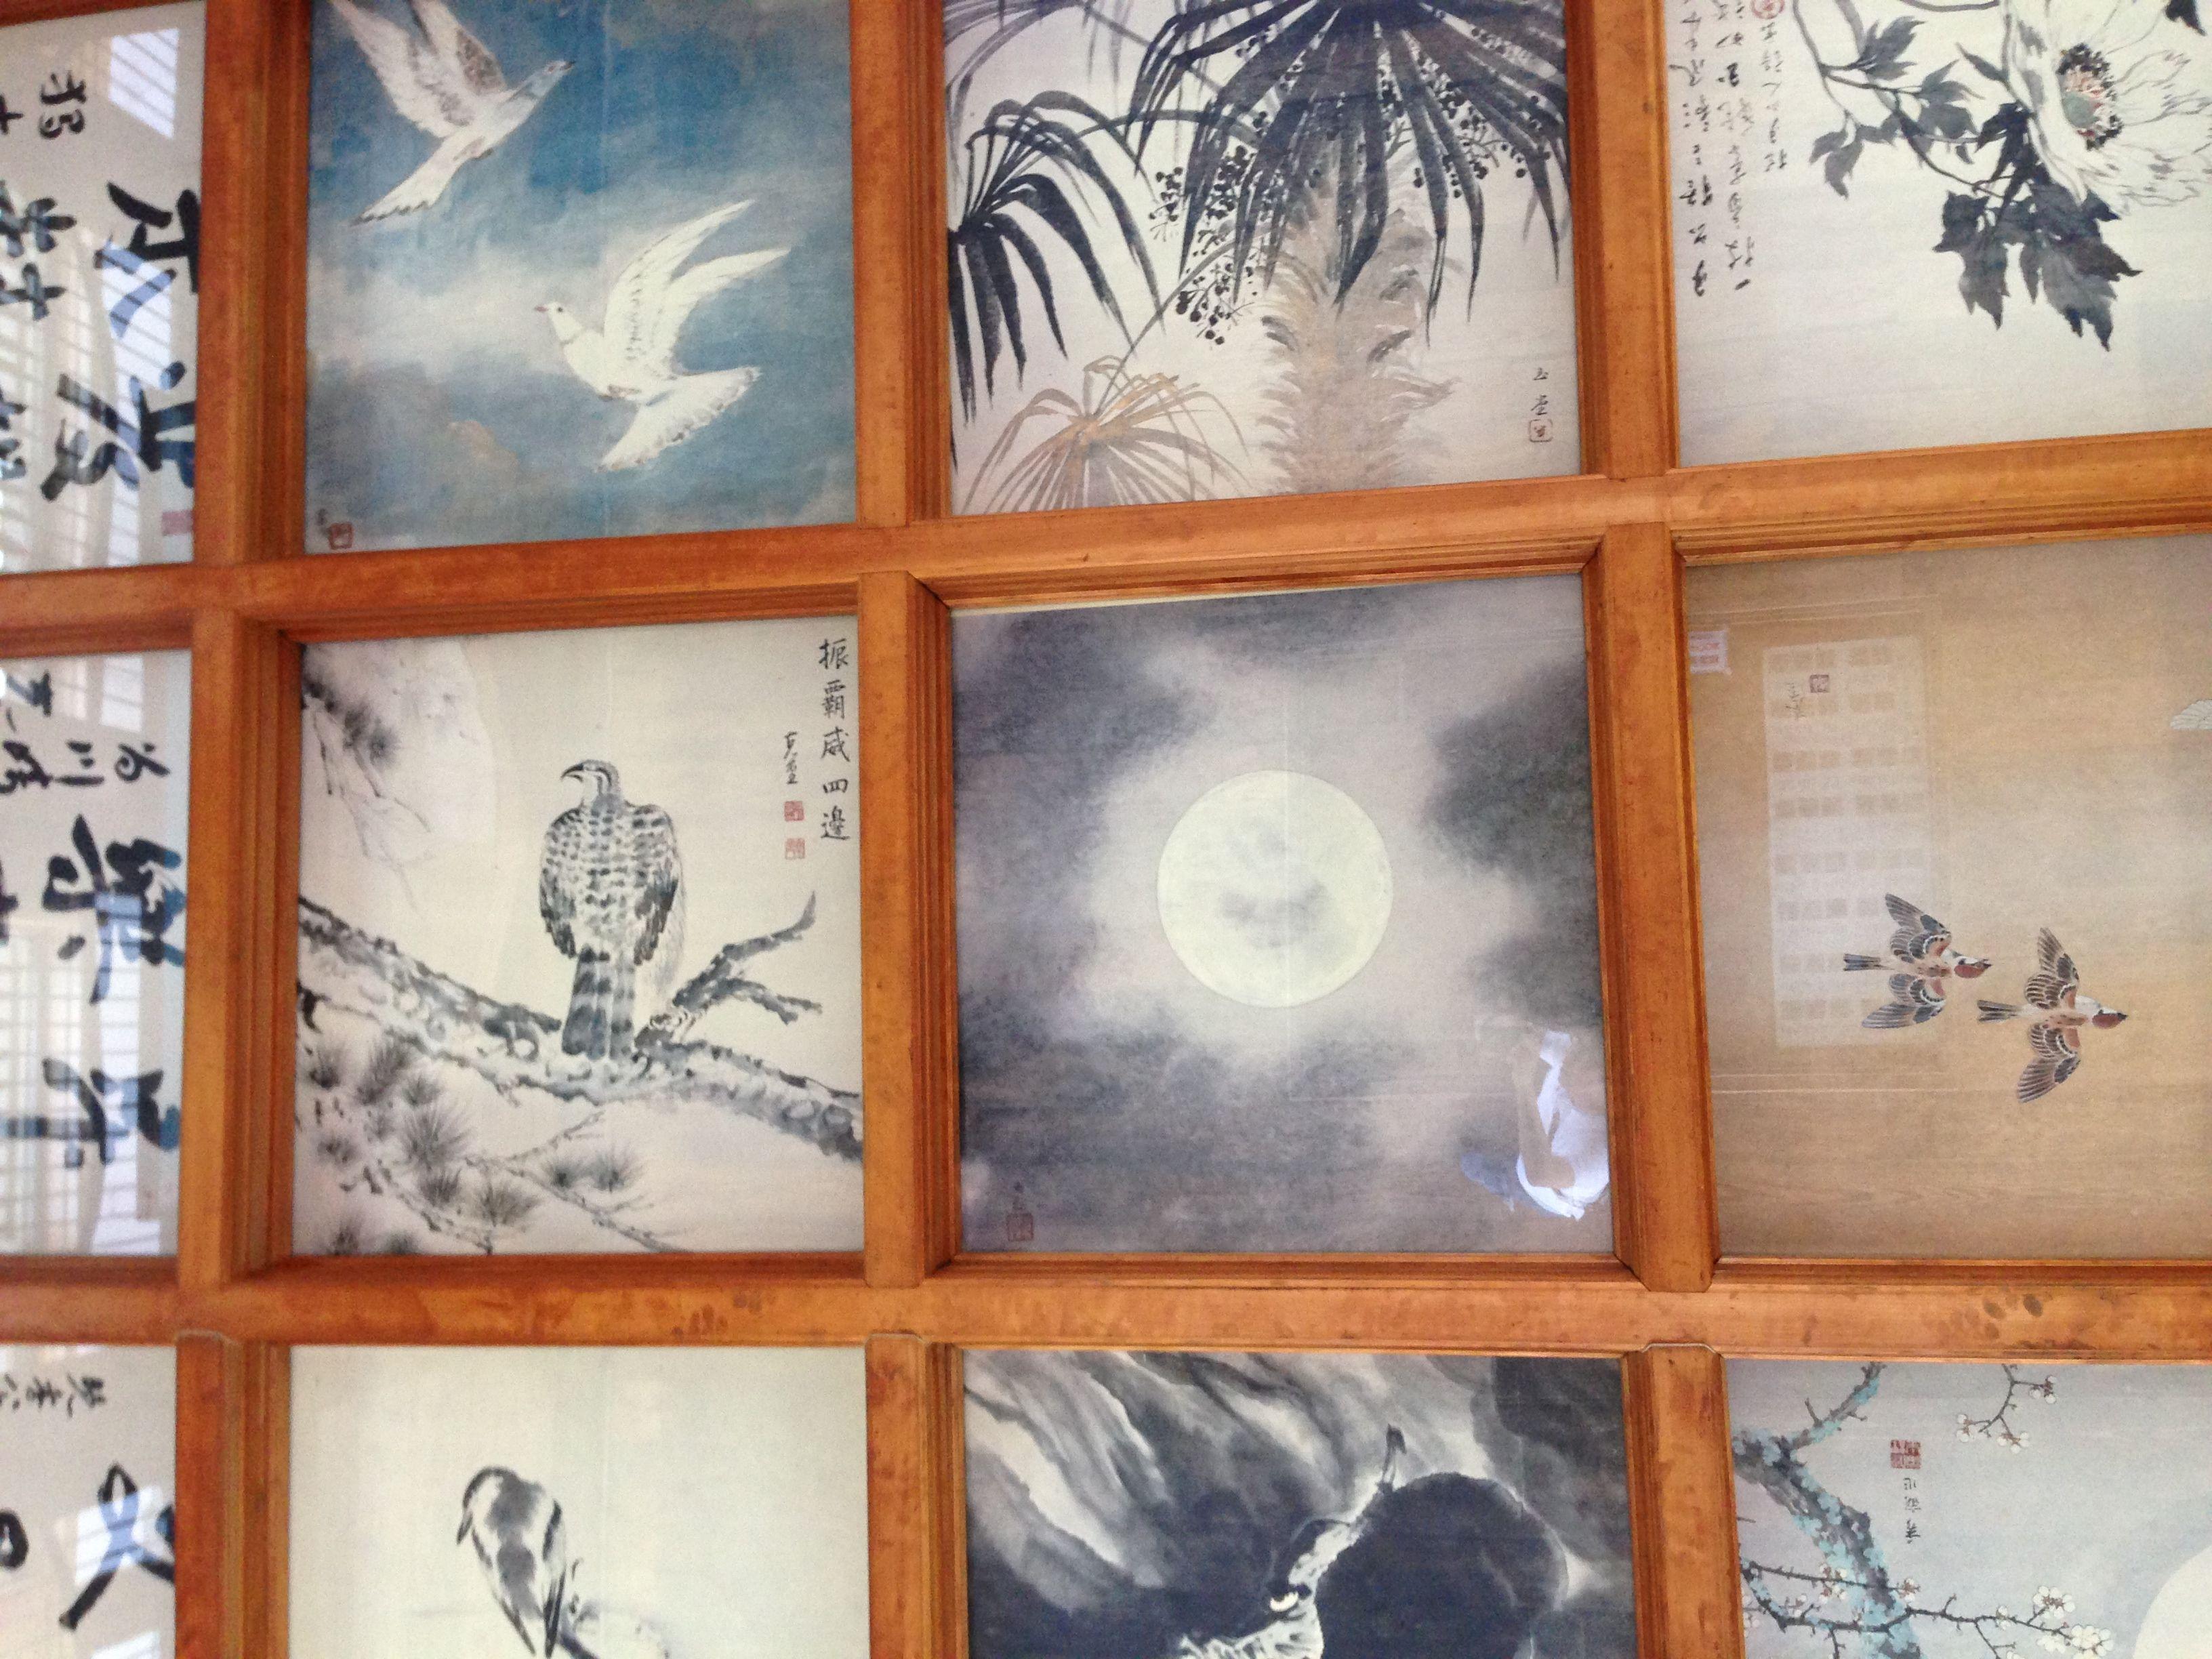 伊賀上野城の最上階の天井の絵 横山大観 天井 絵 横山